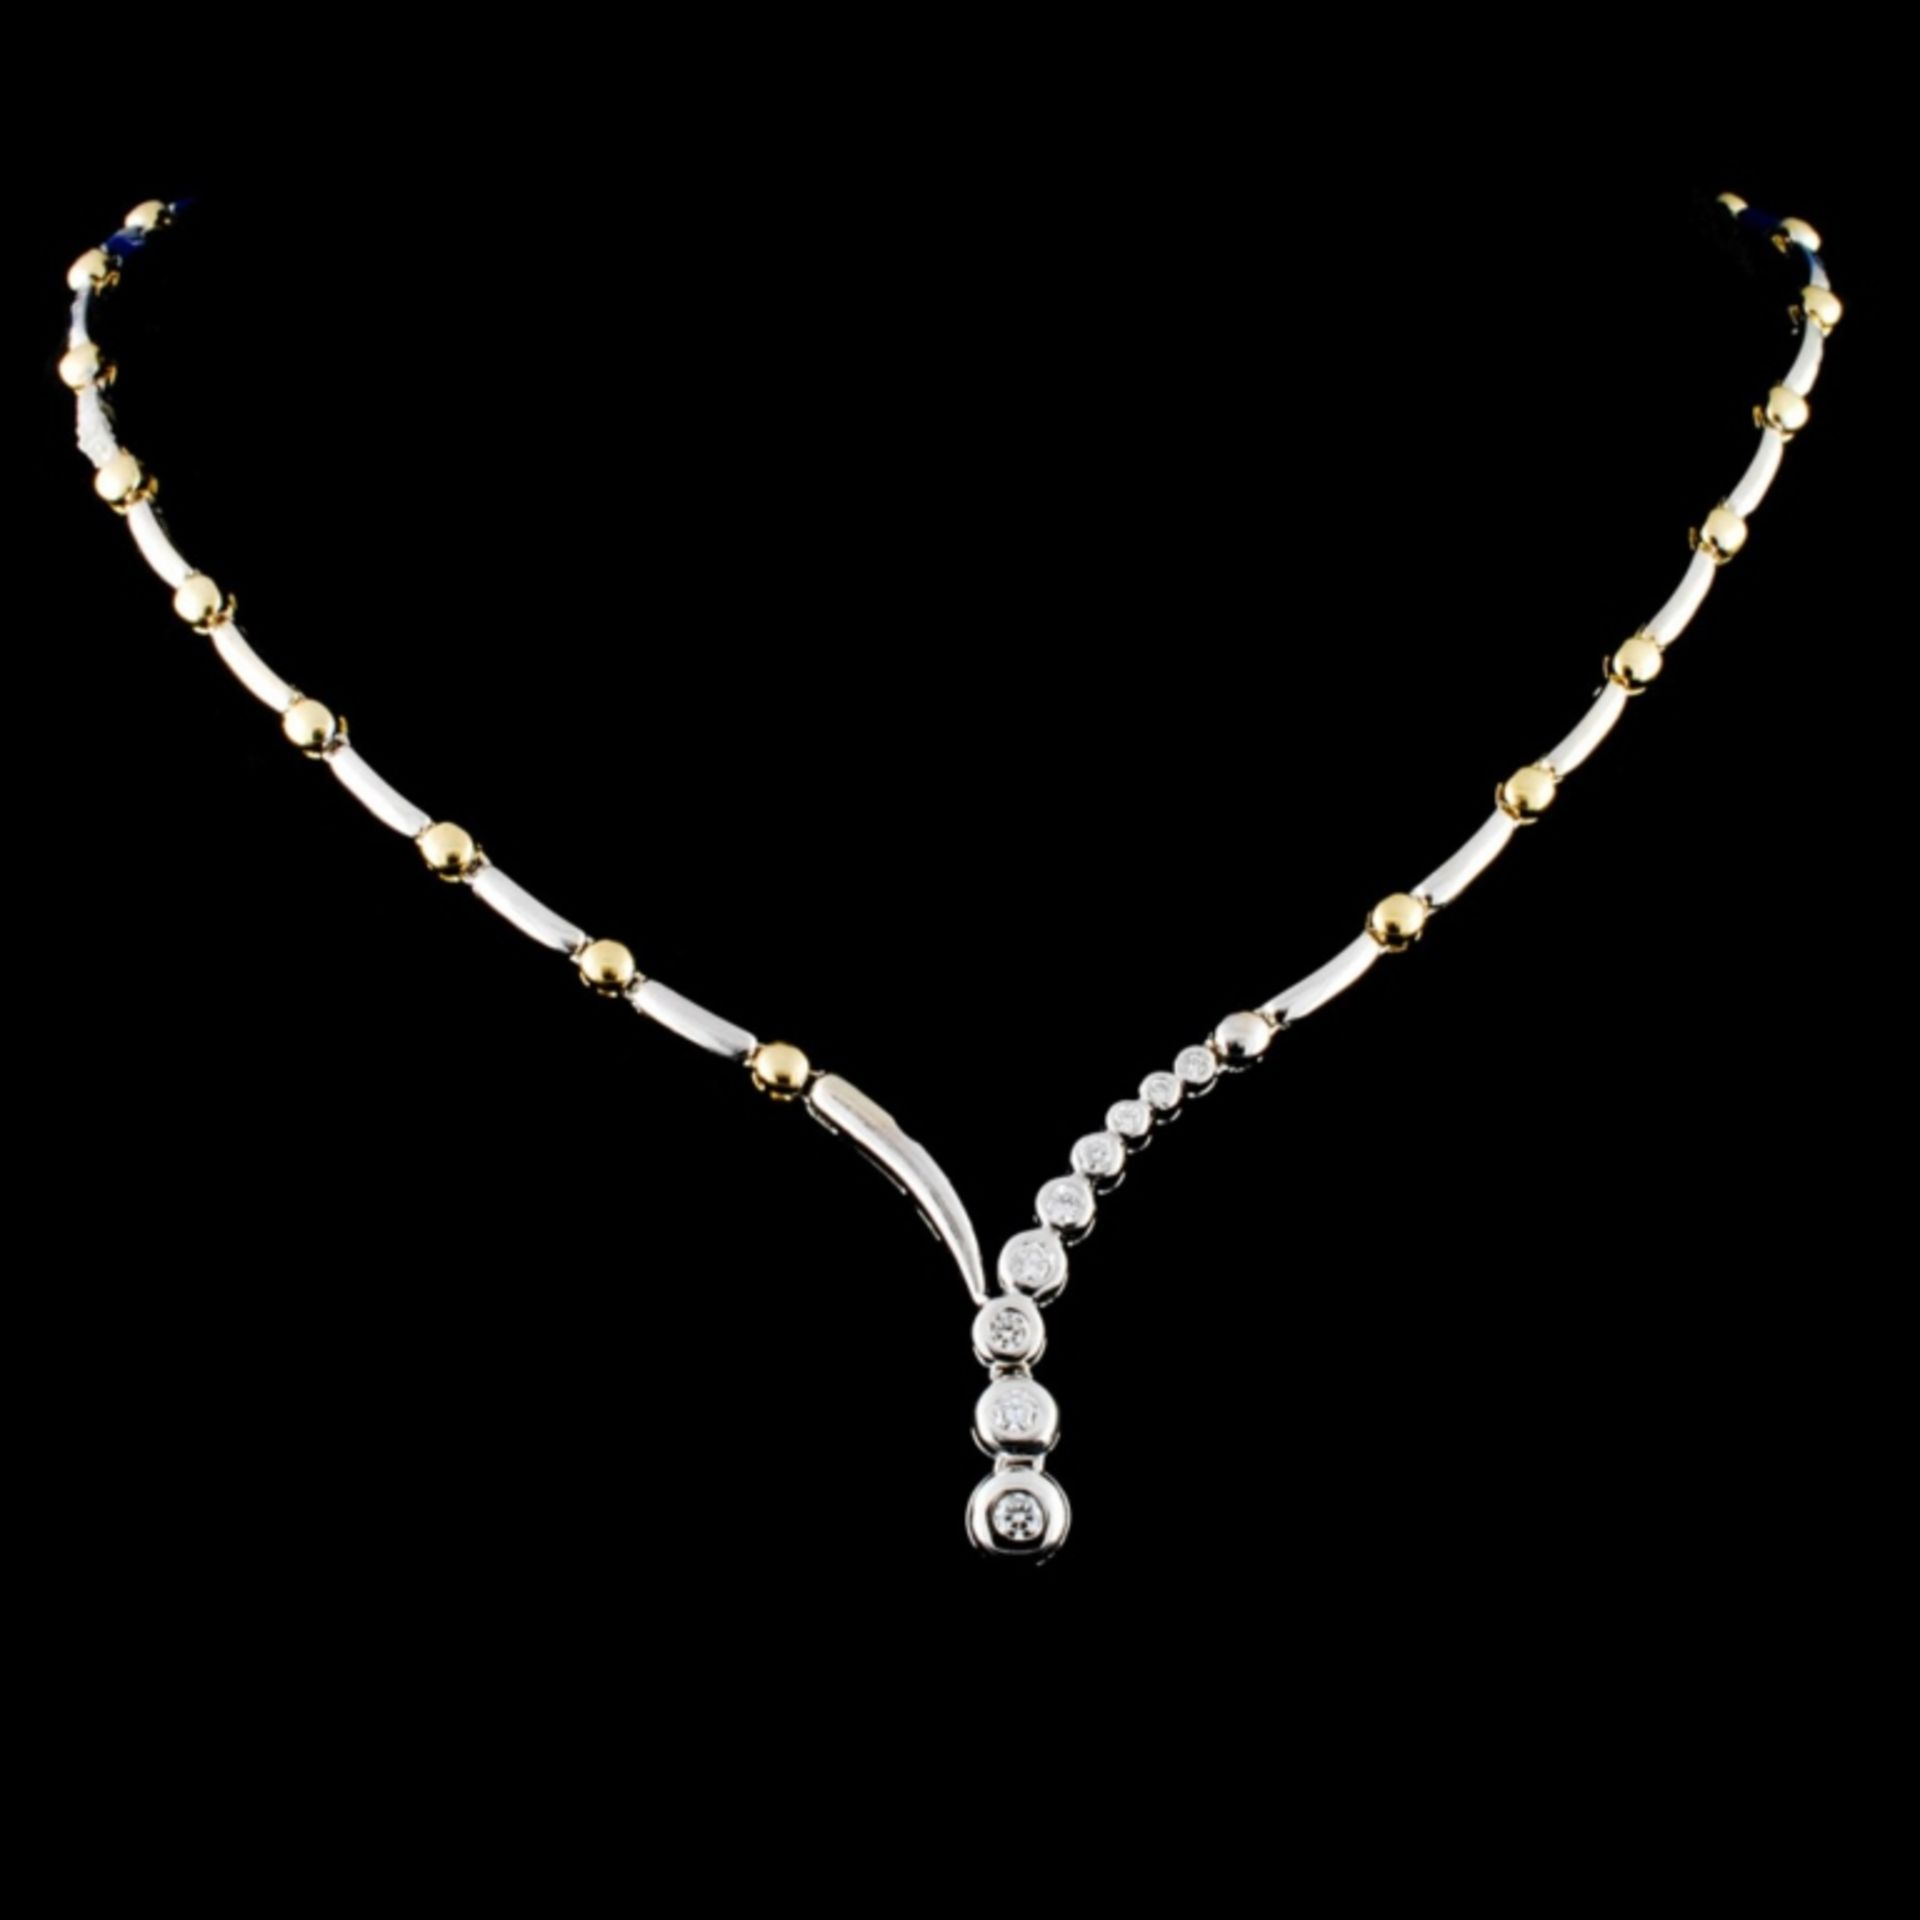 14K Gold 0.46ctw Diamond Necklace - Image 2 of 4